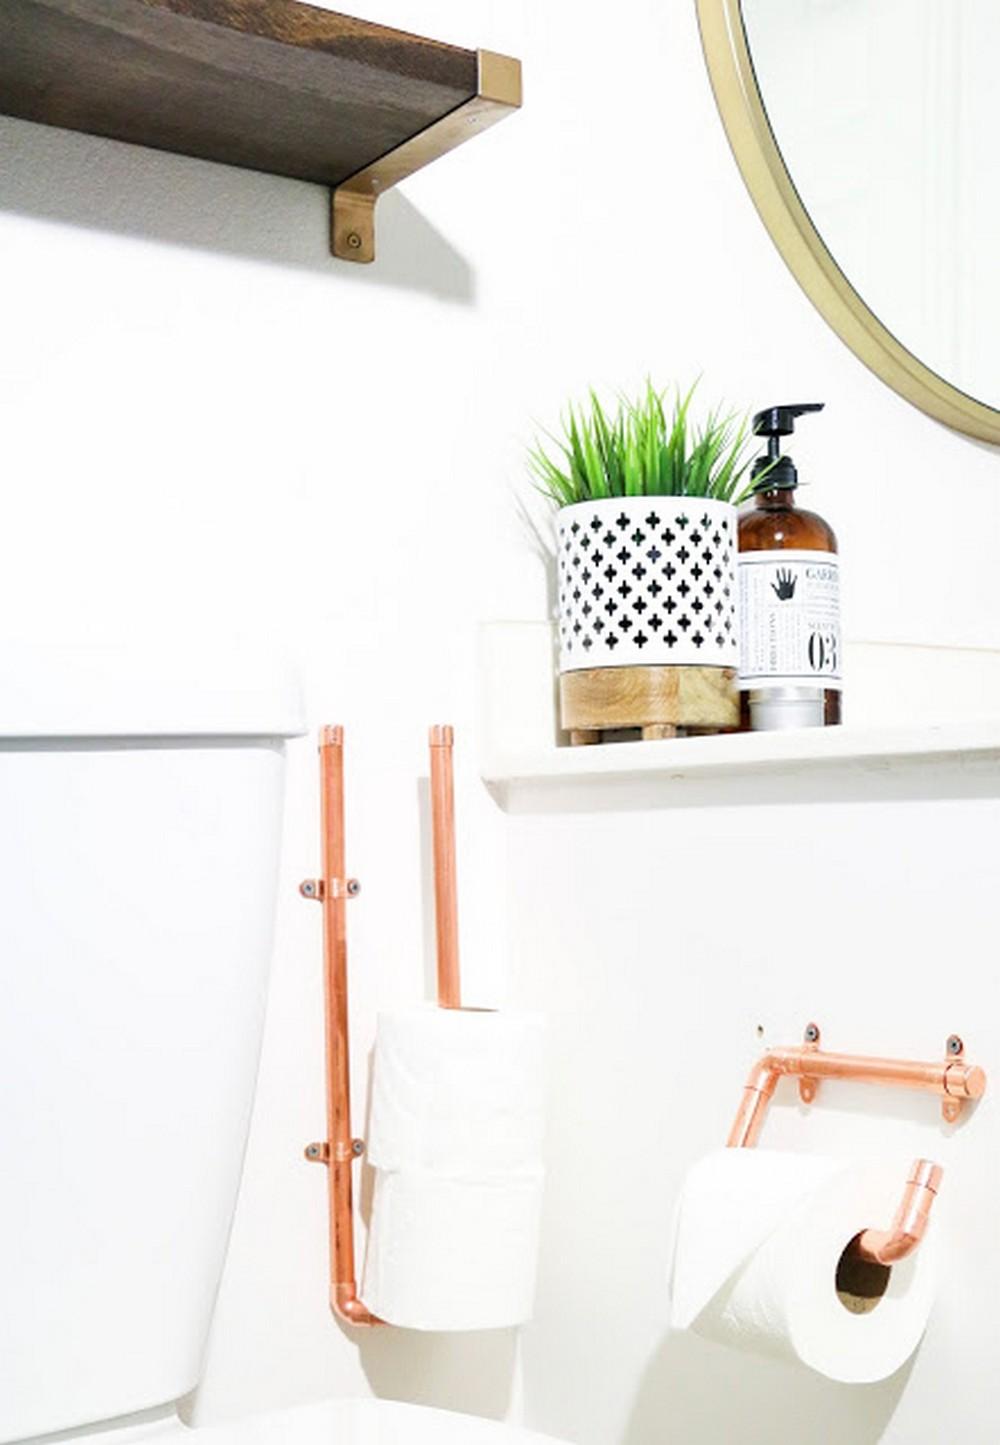 DIY It Copper Toilet Paper Holders